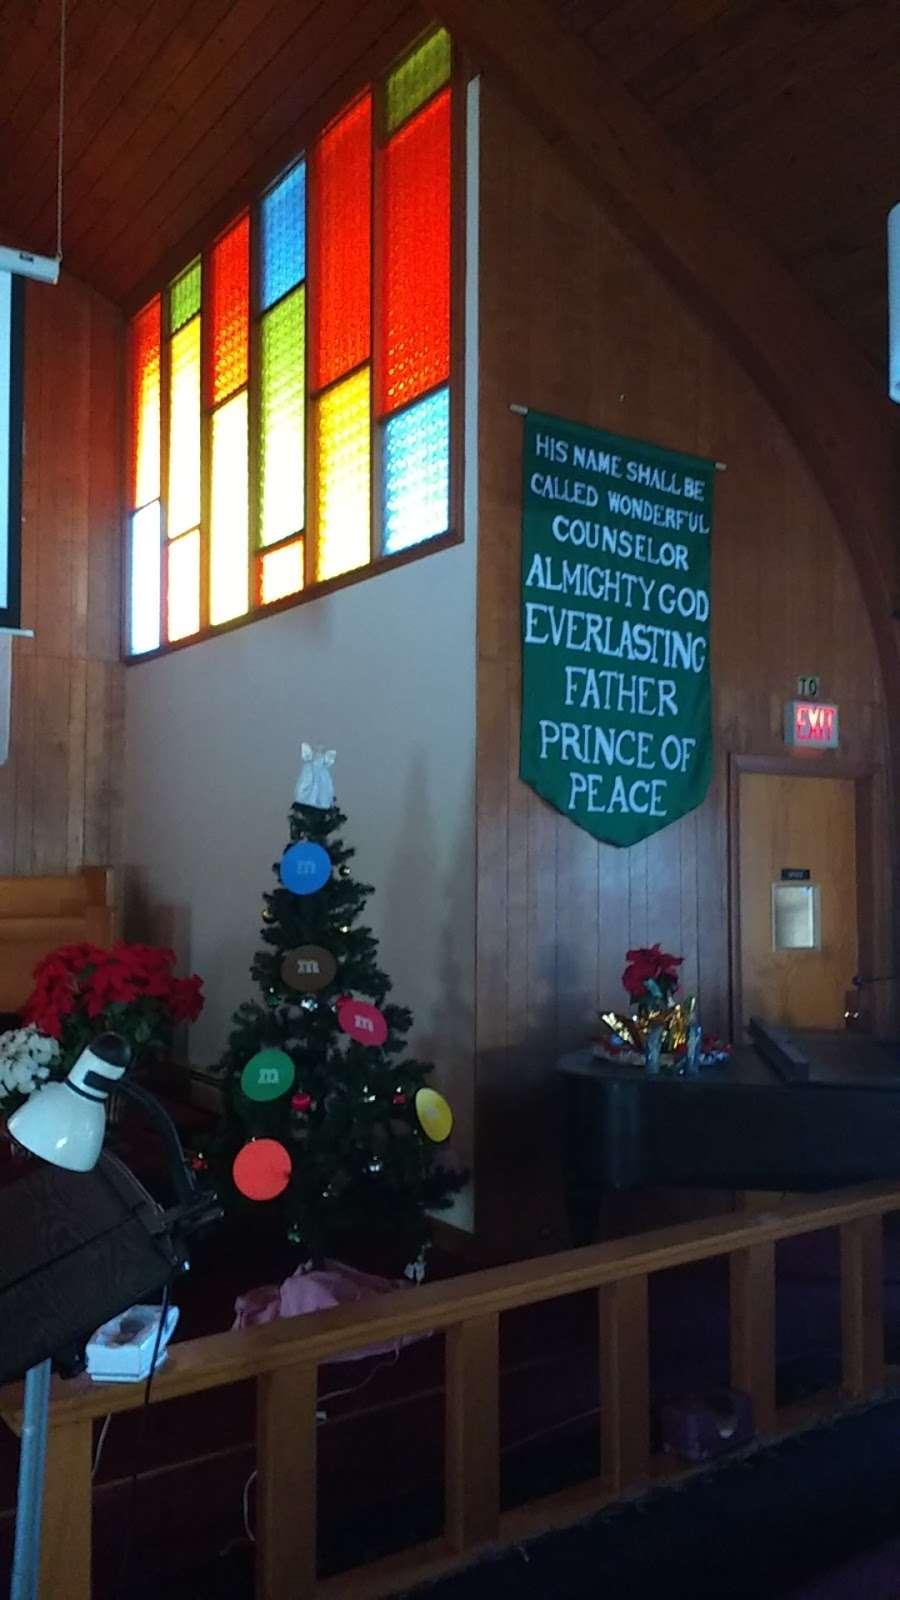 Lakeville Church of Nazarene - church    Photo 4 of 4   Address: 180 Main St, Lakeville, MA 02347, USA   Phone: (508) 946-5287